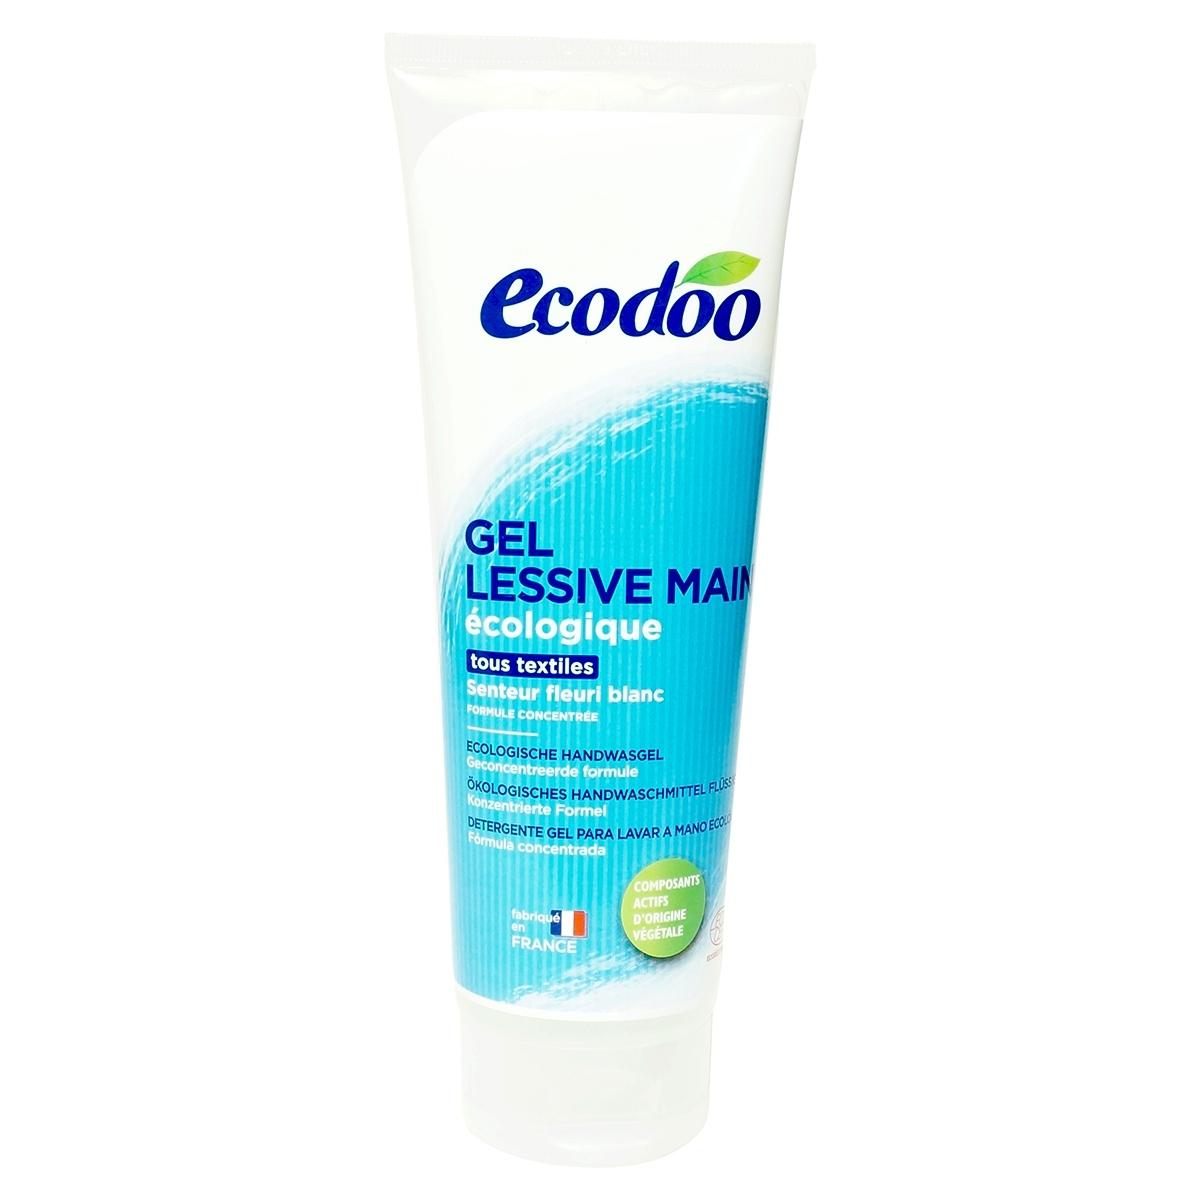 ECODOO Gel lessive main - 250 ml